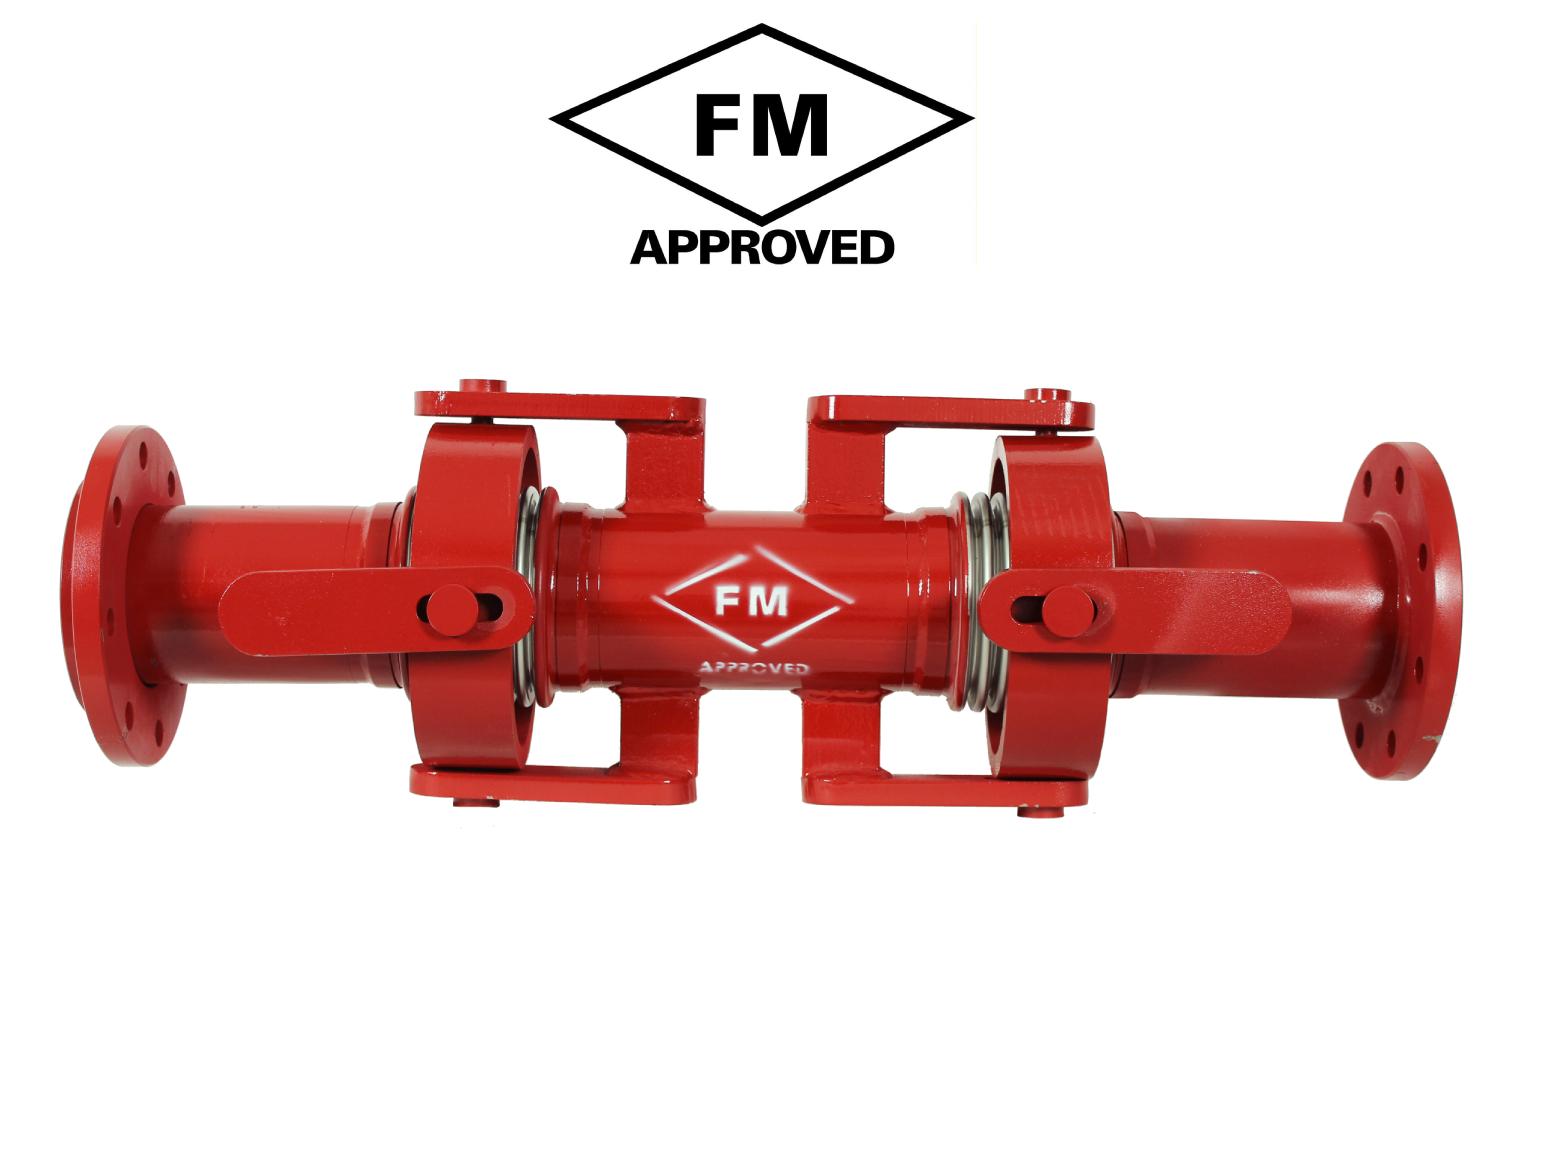 FM Onaylı Kardan Mafsallı Deprem Kompansatörü - Flanşlı